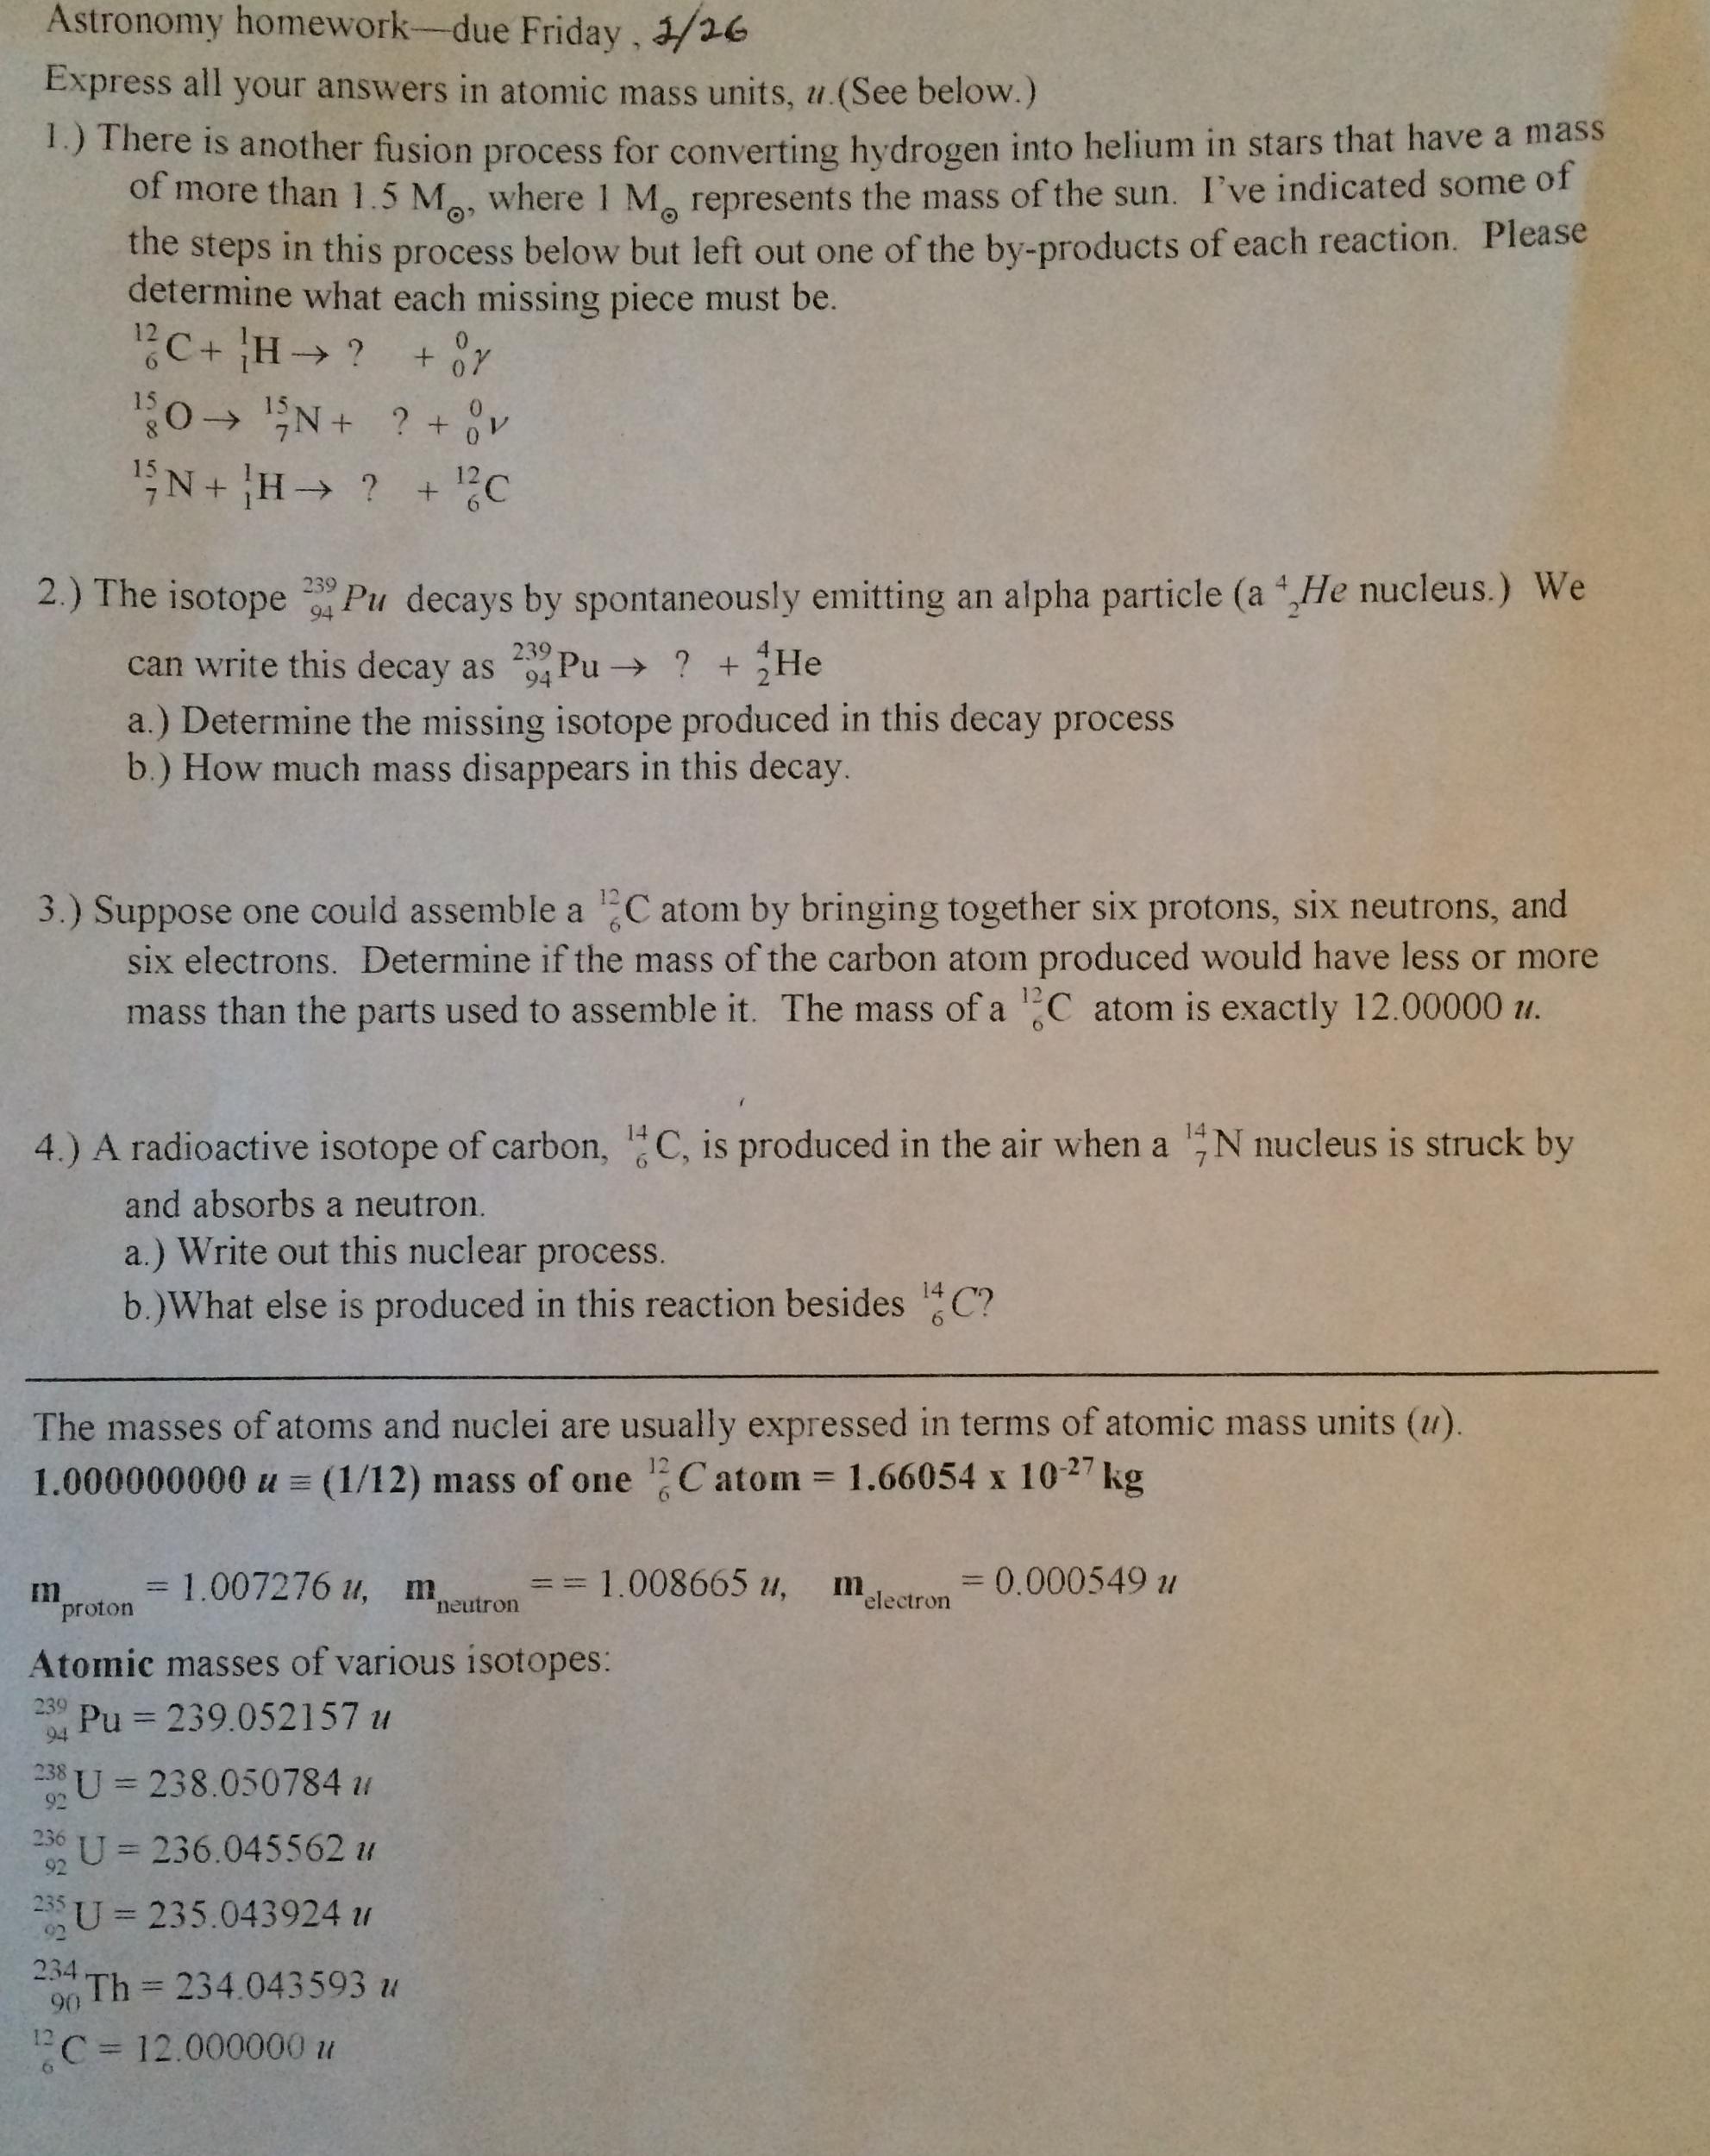 Astronomy homework help answers